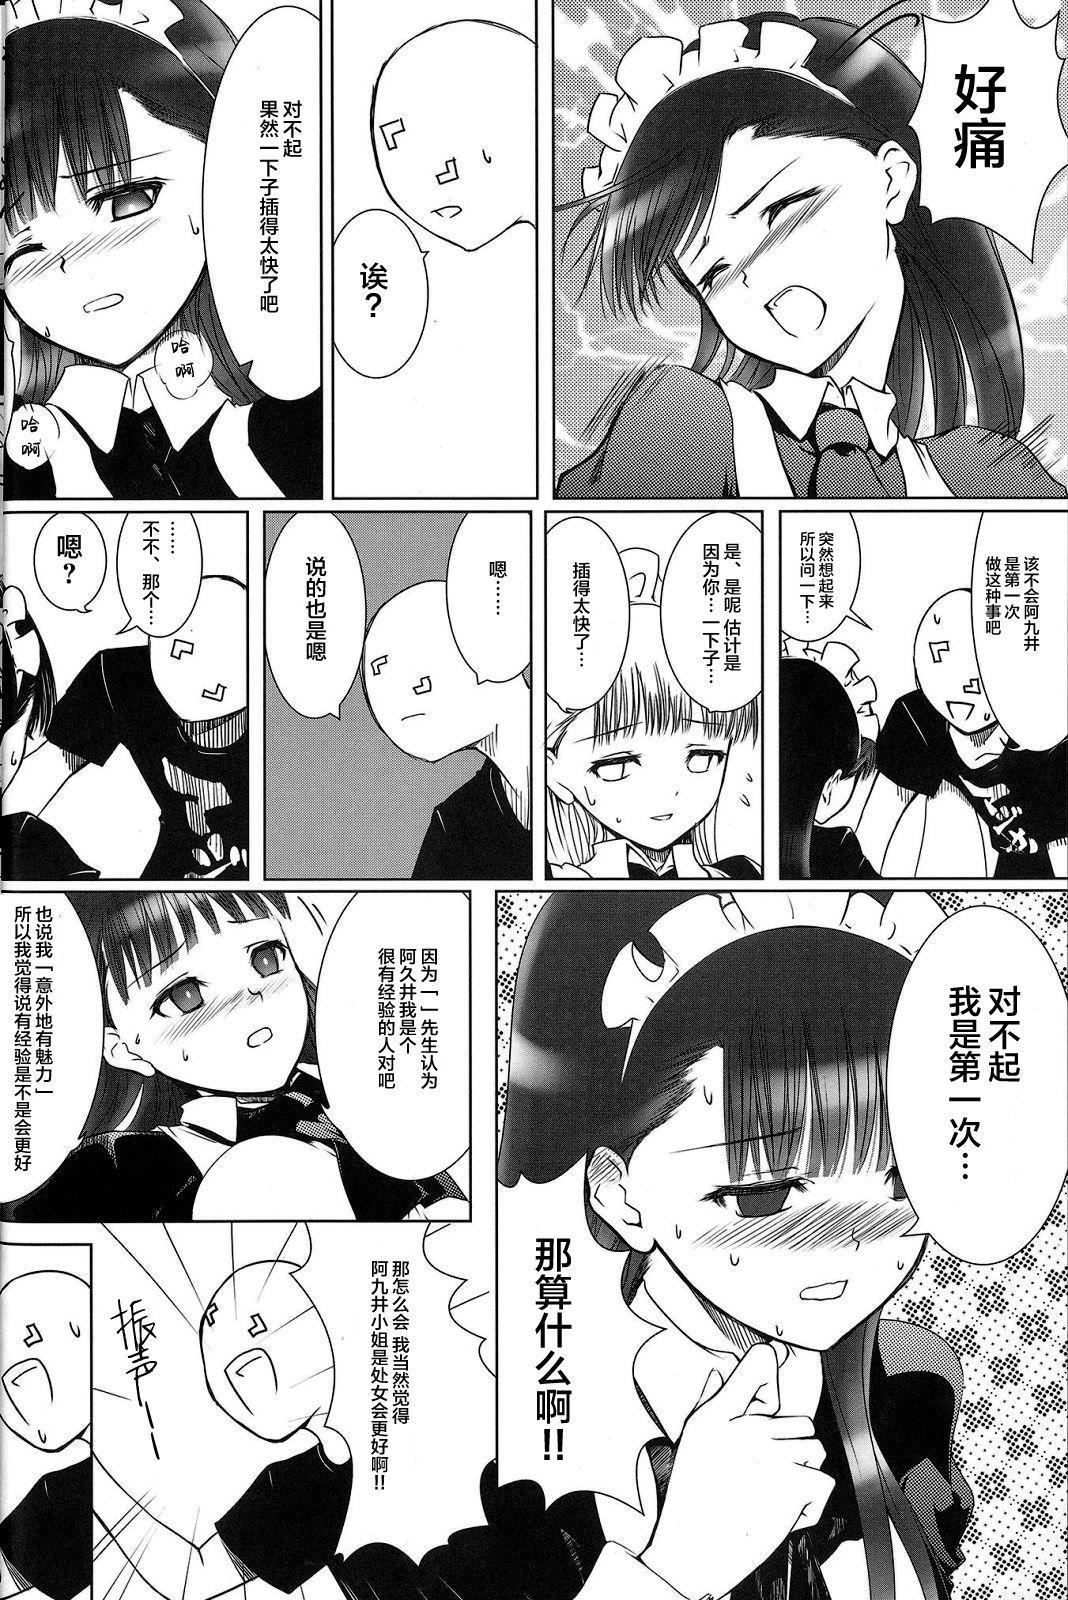 [Heikoushihenkei (Kawanakajima)] Akui-san ga Kaze hi-ta 1 | 阿九井小姐得了感冒1 [Chinese] [lolipoi汉化组] [2014-06-10] 17